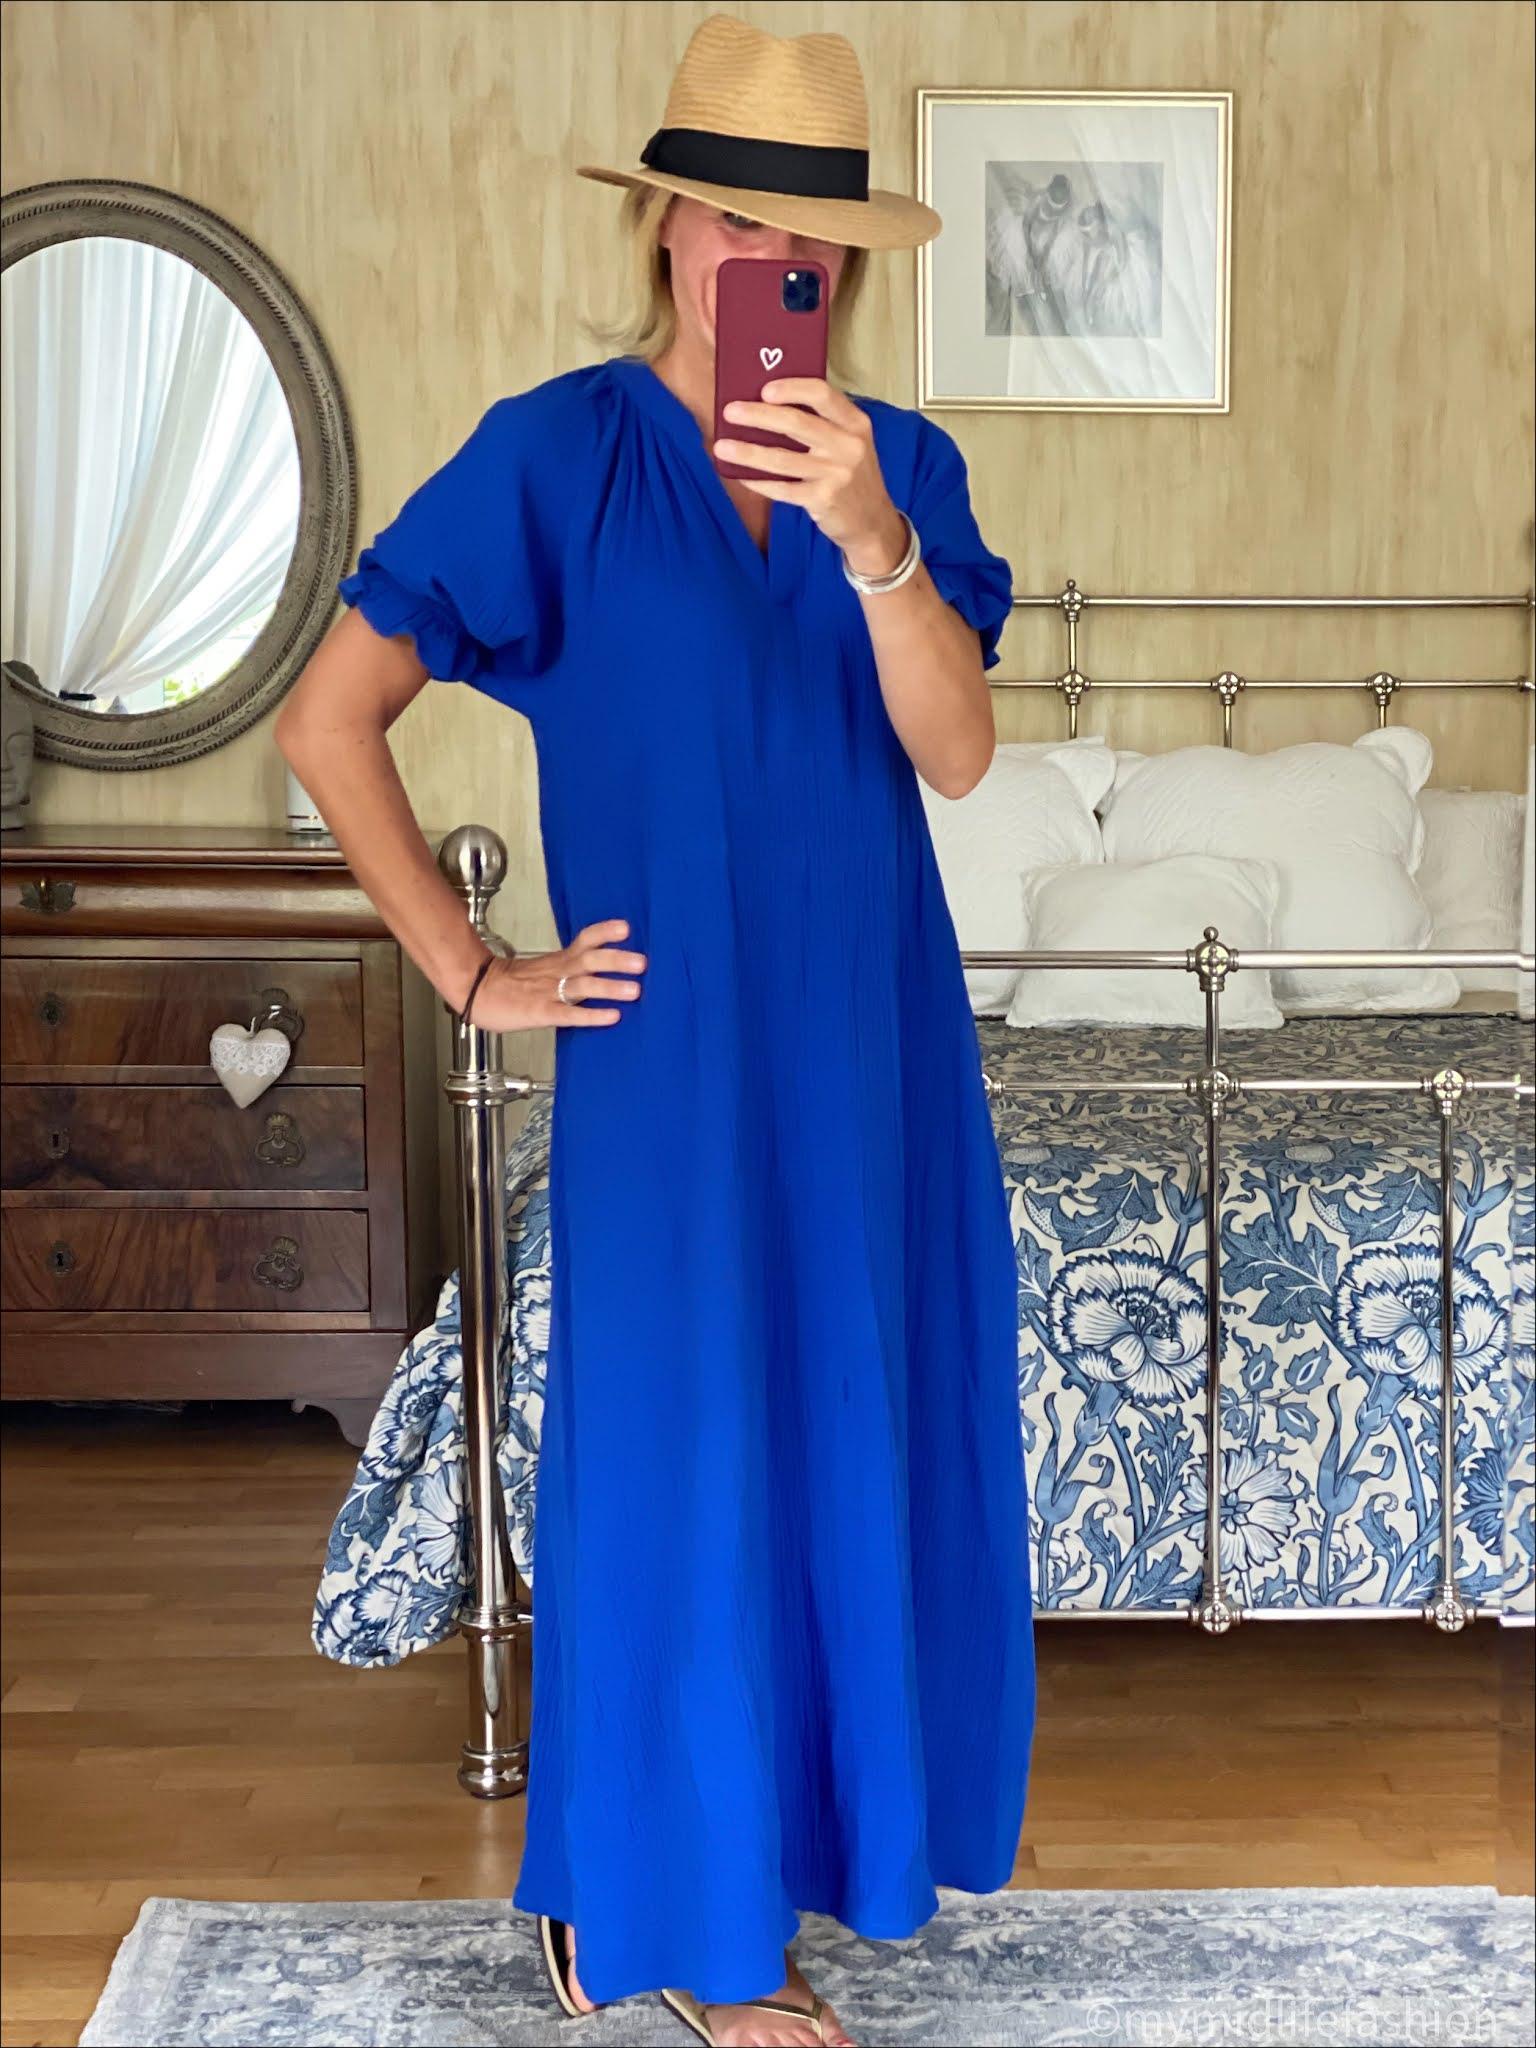 my midlife fashion, scarlet roos maxi dress, H&M Panama hat, havaianas slim fit flip flops